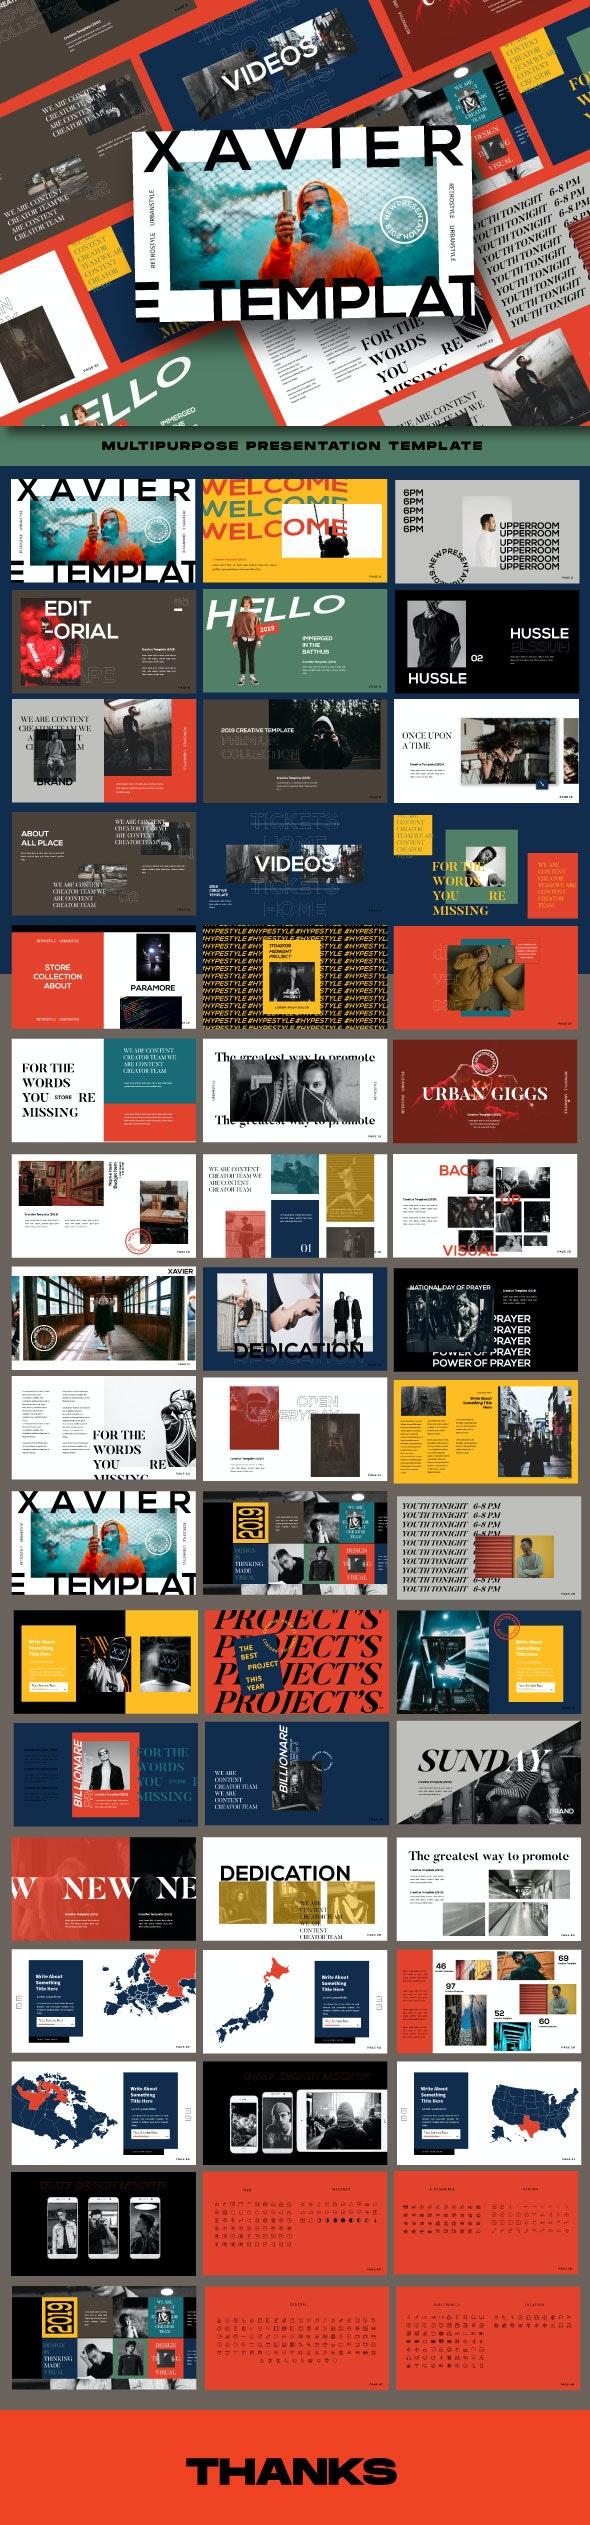 Xavier Googleslide Presentation Templates - Google Slides Presentation Templates